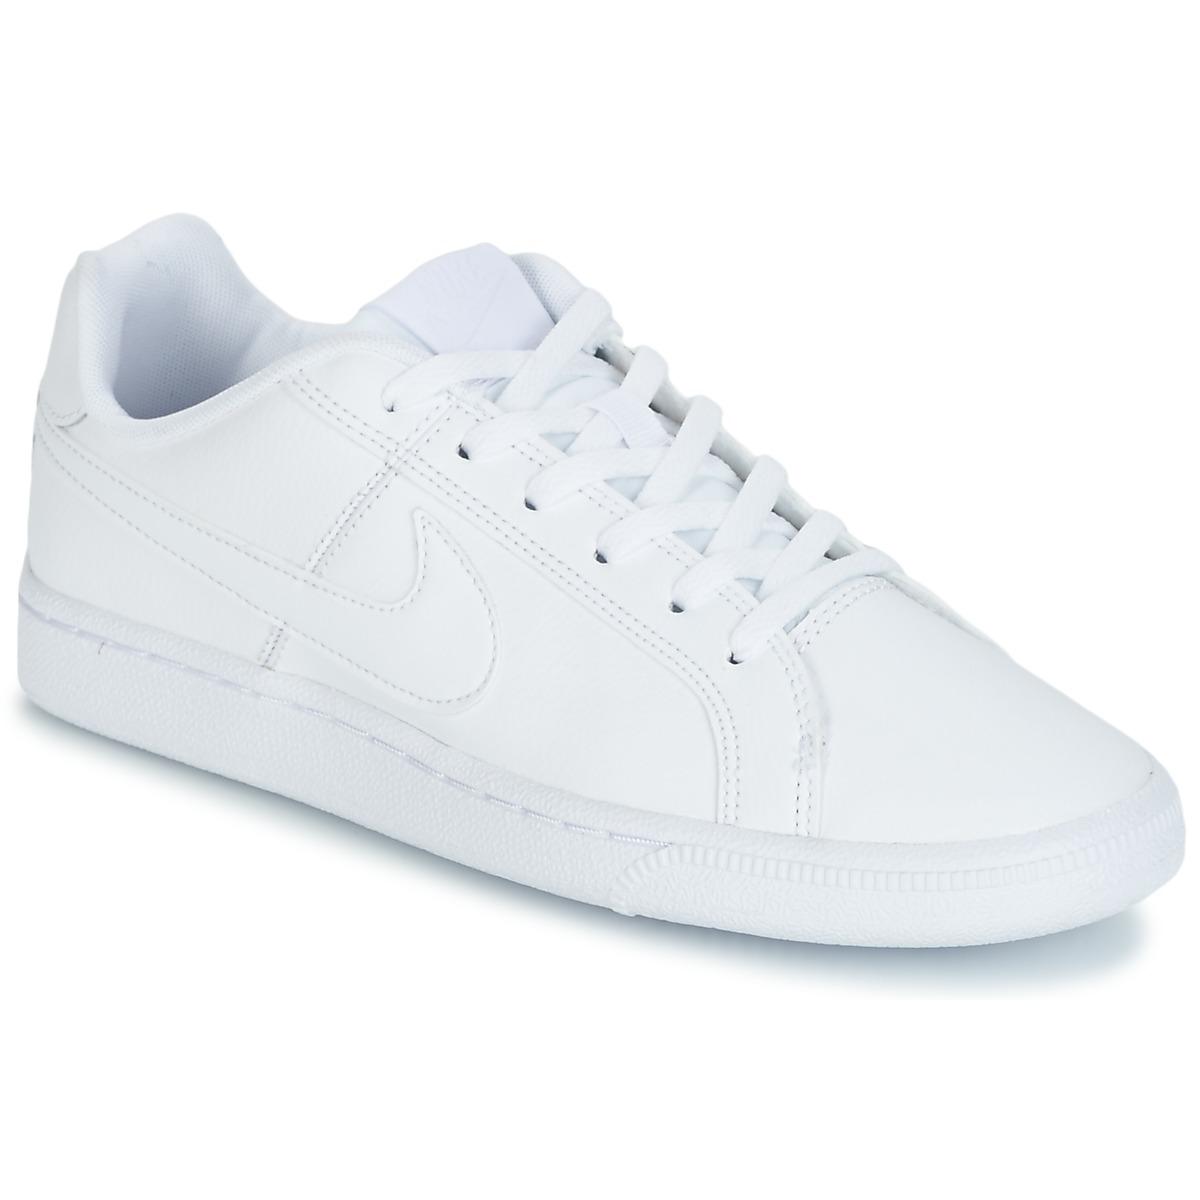 cb332ba6aca Nike COURT ROYALE GRADE SCHOOL Wit - Gratis levering | Spartoo.nl ! -  Schoenen Lage sneakers Kind € 49,99